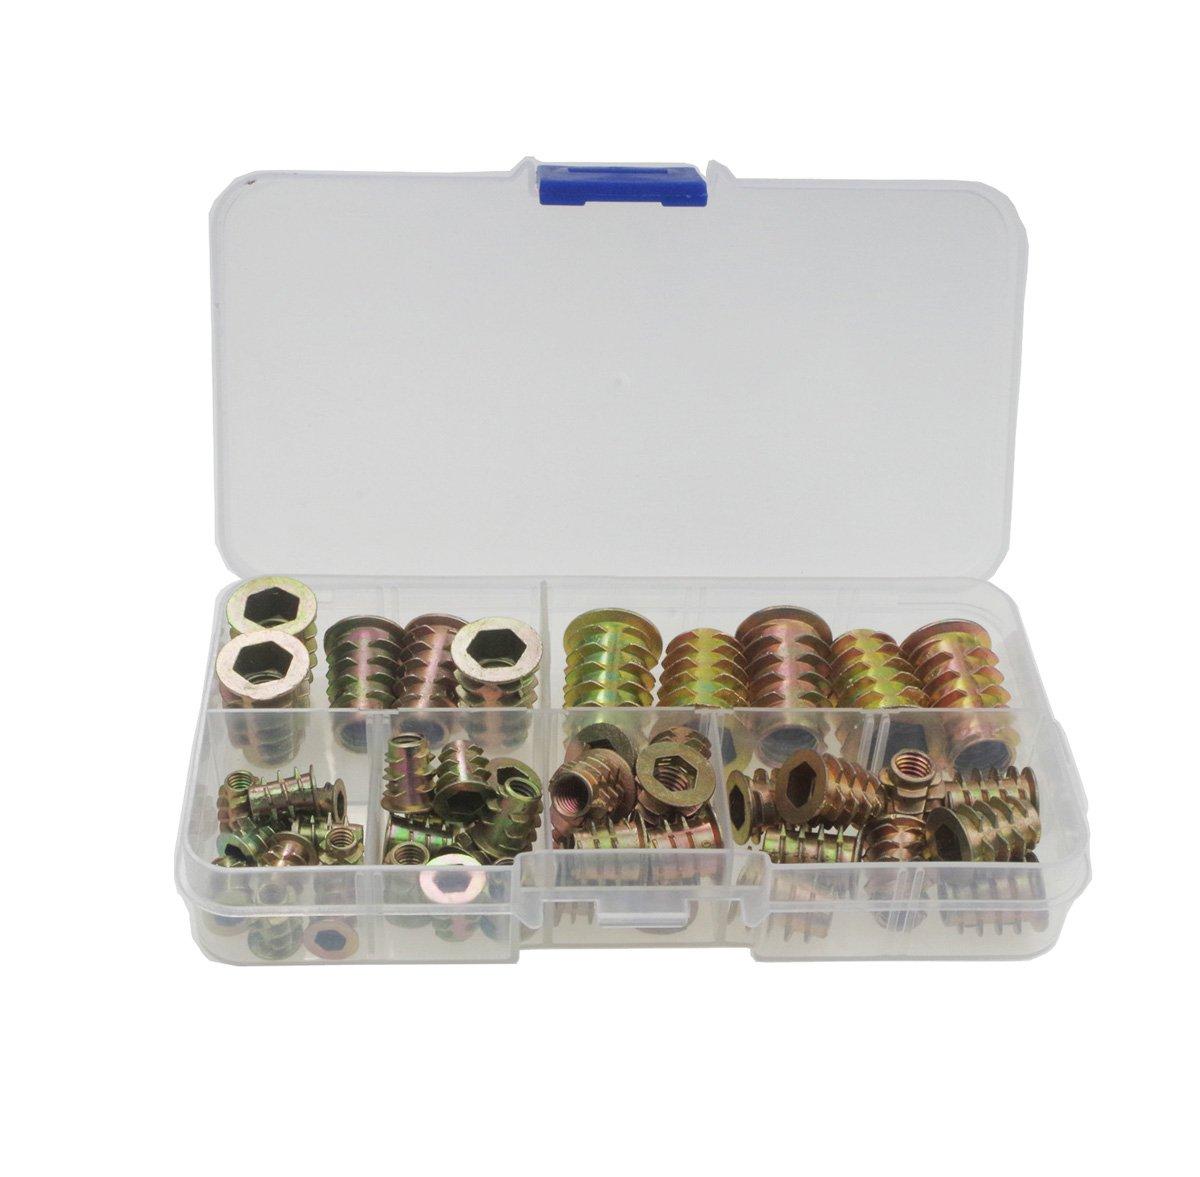 Haobase 50pcs M4 M5 M6 M8 M10 Zinc Alloy Furniture Hex Drive Head Nut Threaded For Wood Insert Metric Assortment Kit